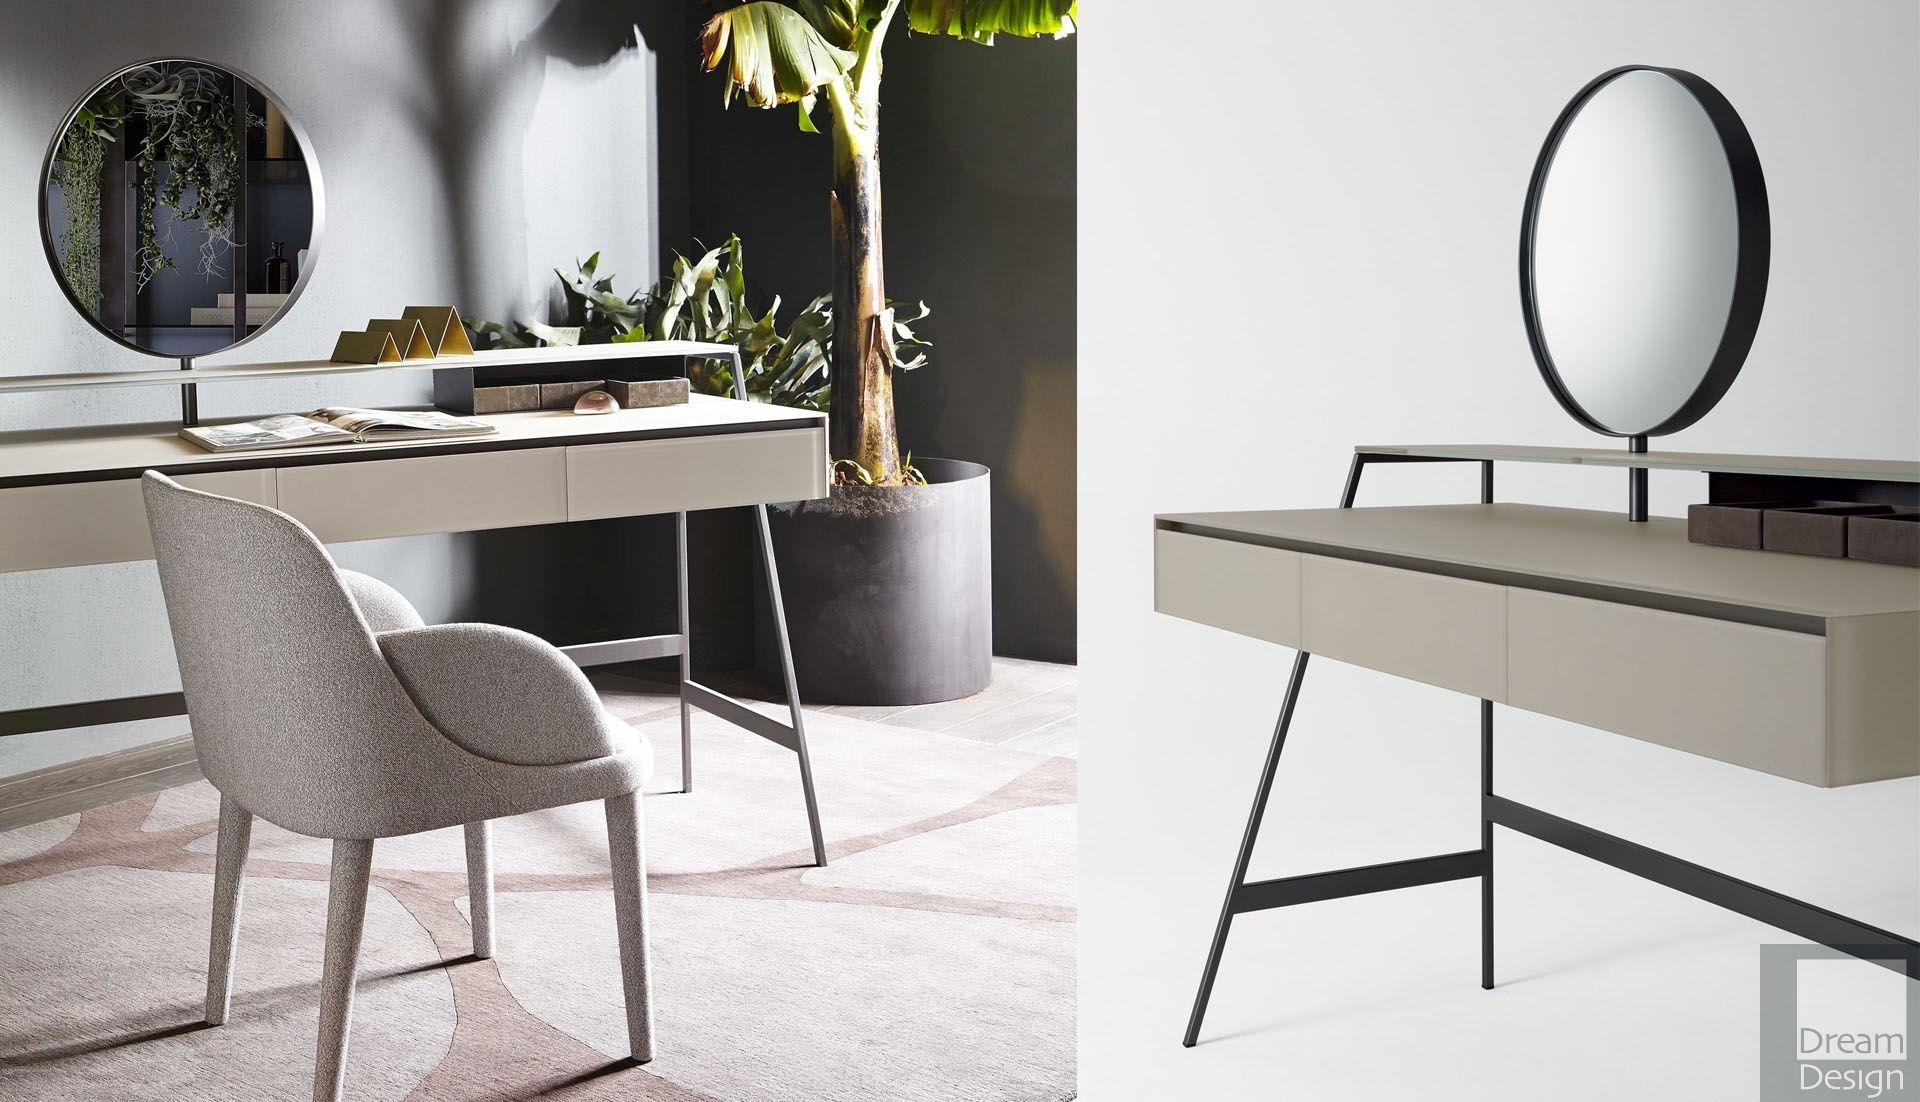 gallotti radice venere dressing table by carlo colombo ebo. Black Bedroom Furniture Sets. Home Design Ideas